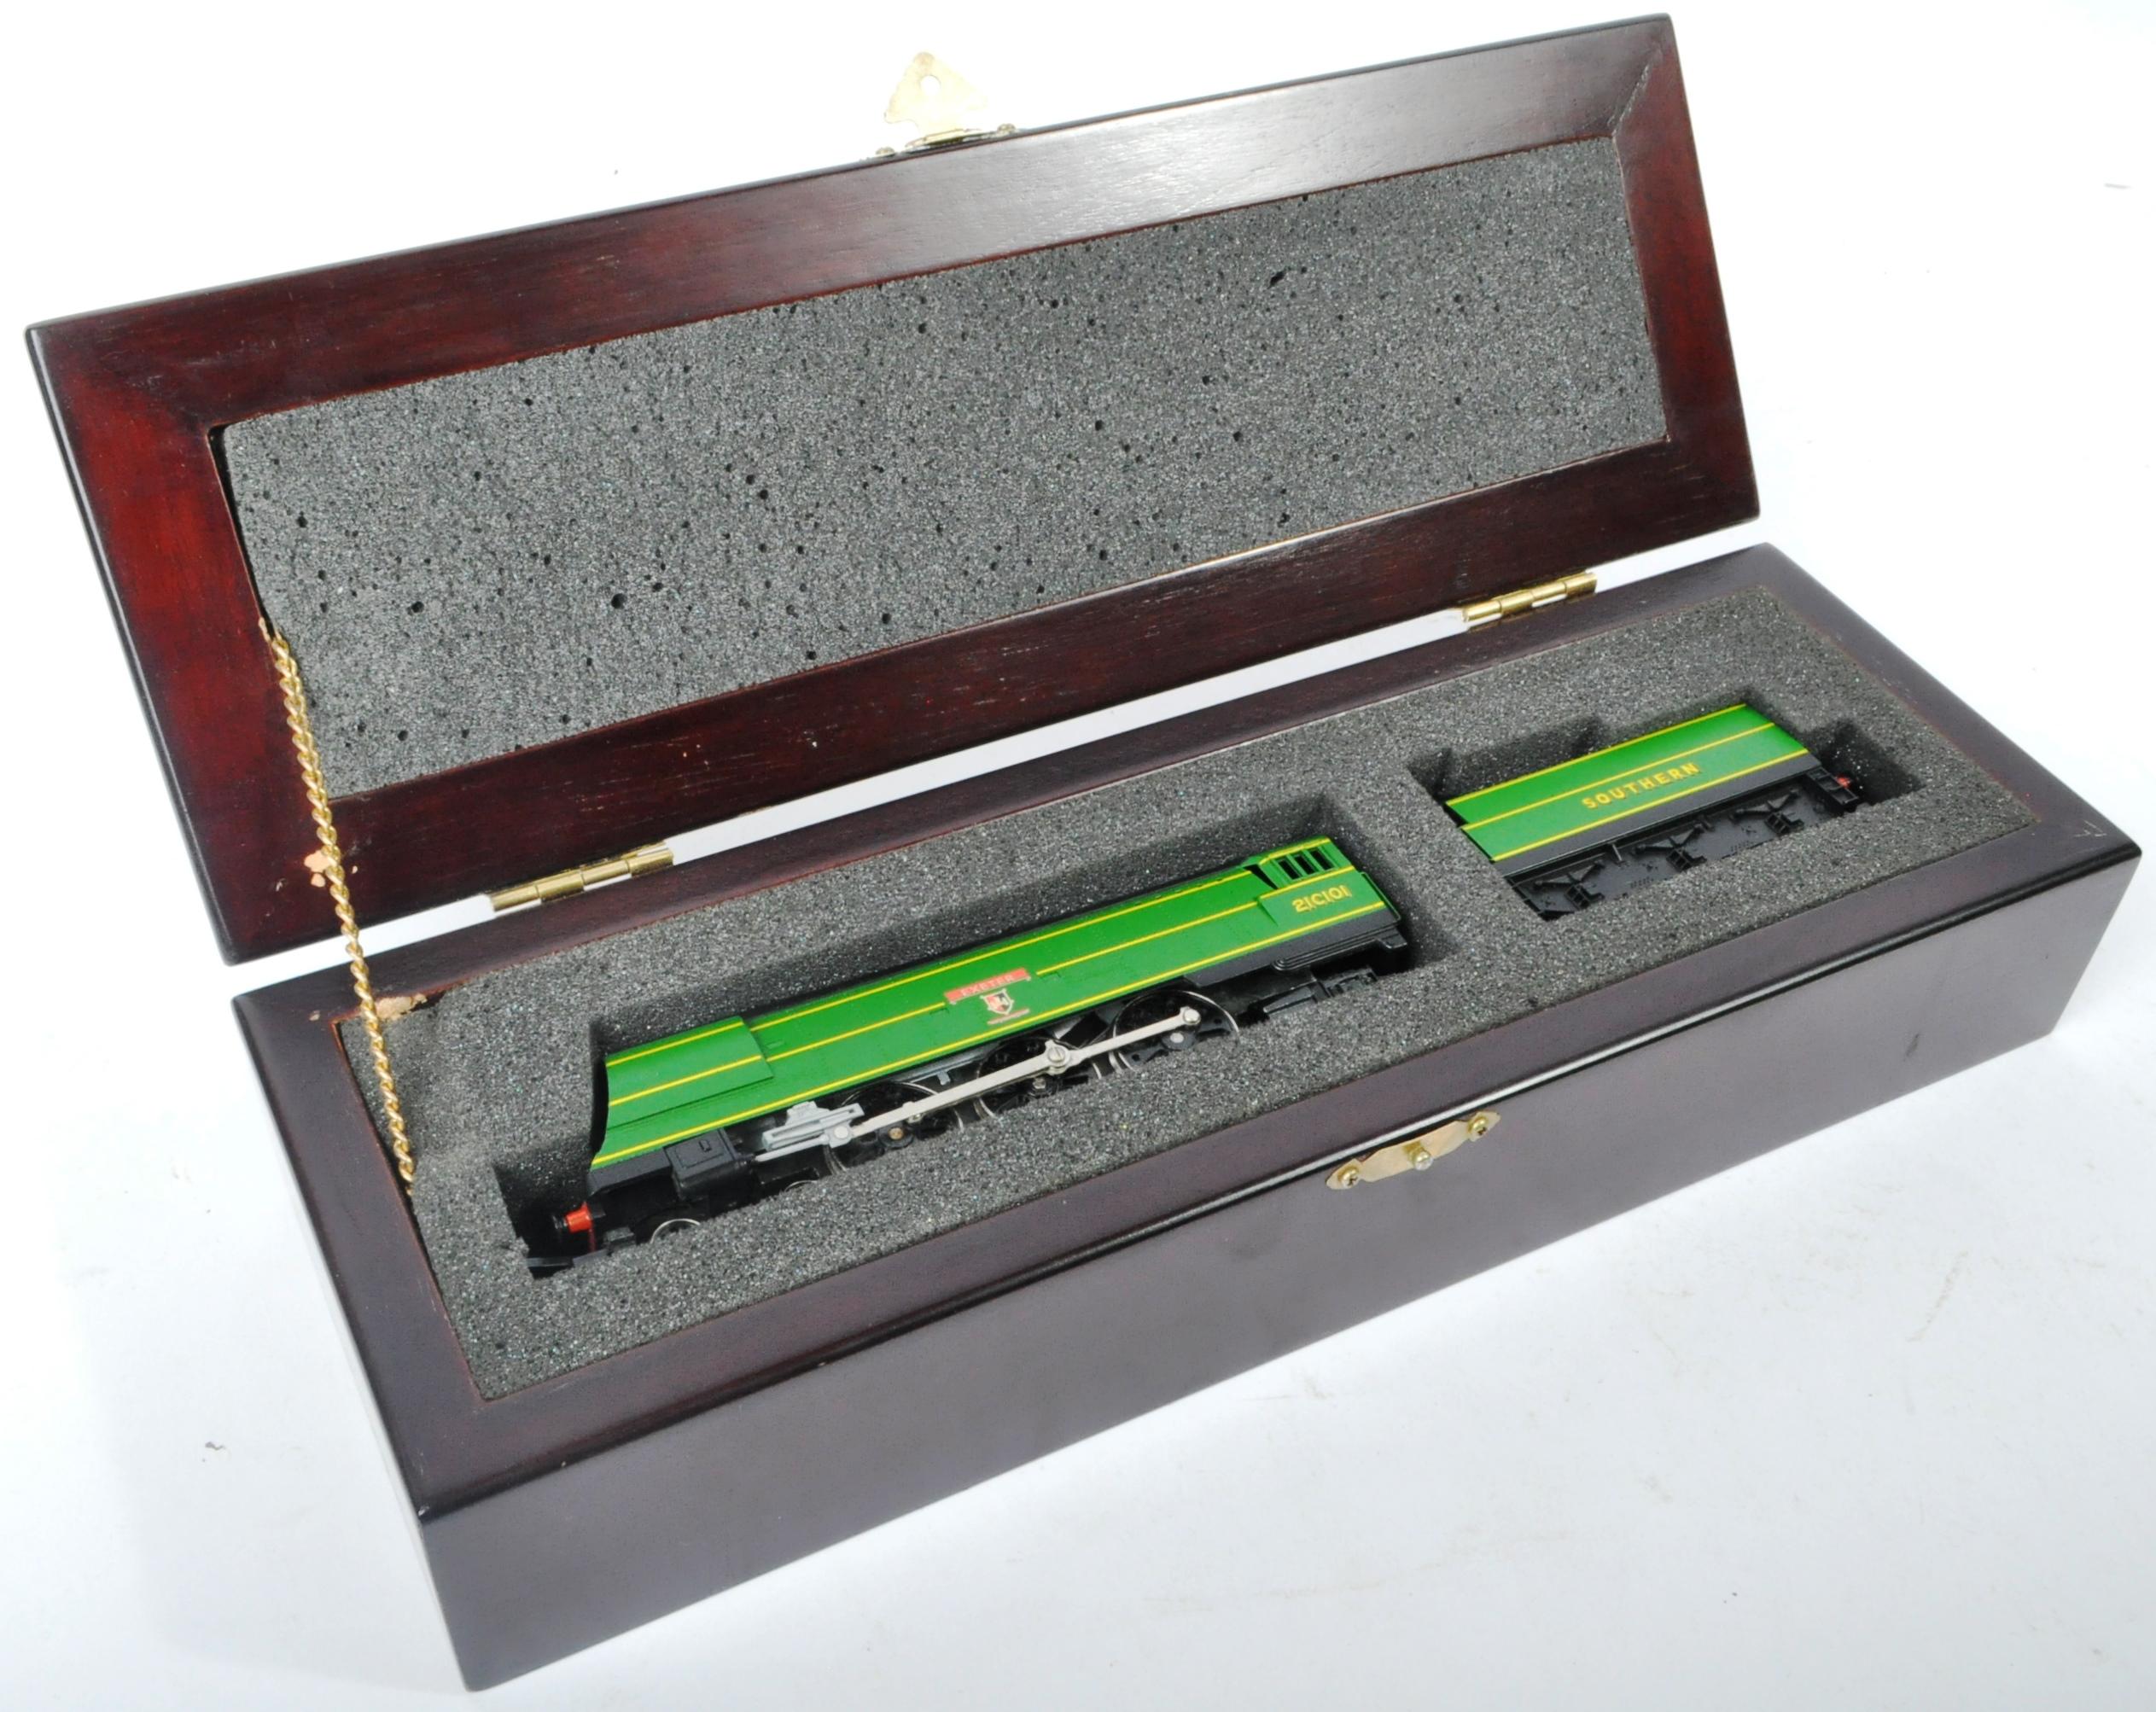 ORIGINAL HORNBY 00 GAUGE MODEL RAILWAY TRAINSET LOCOMOTIVE - Image 5 of 5